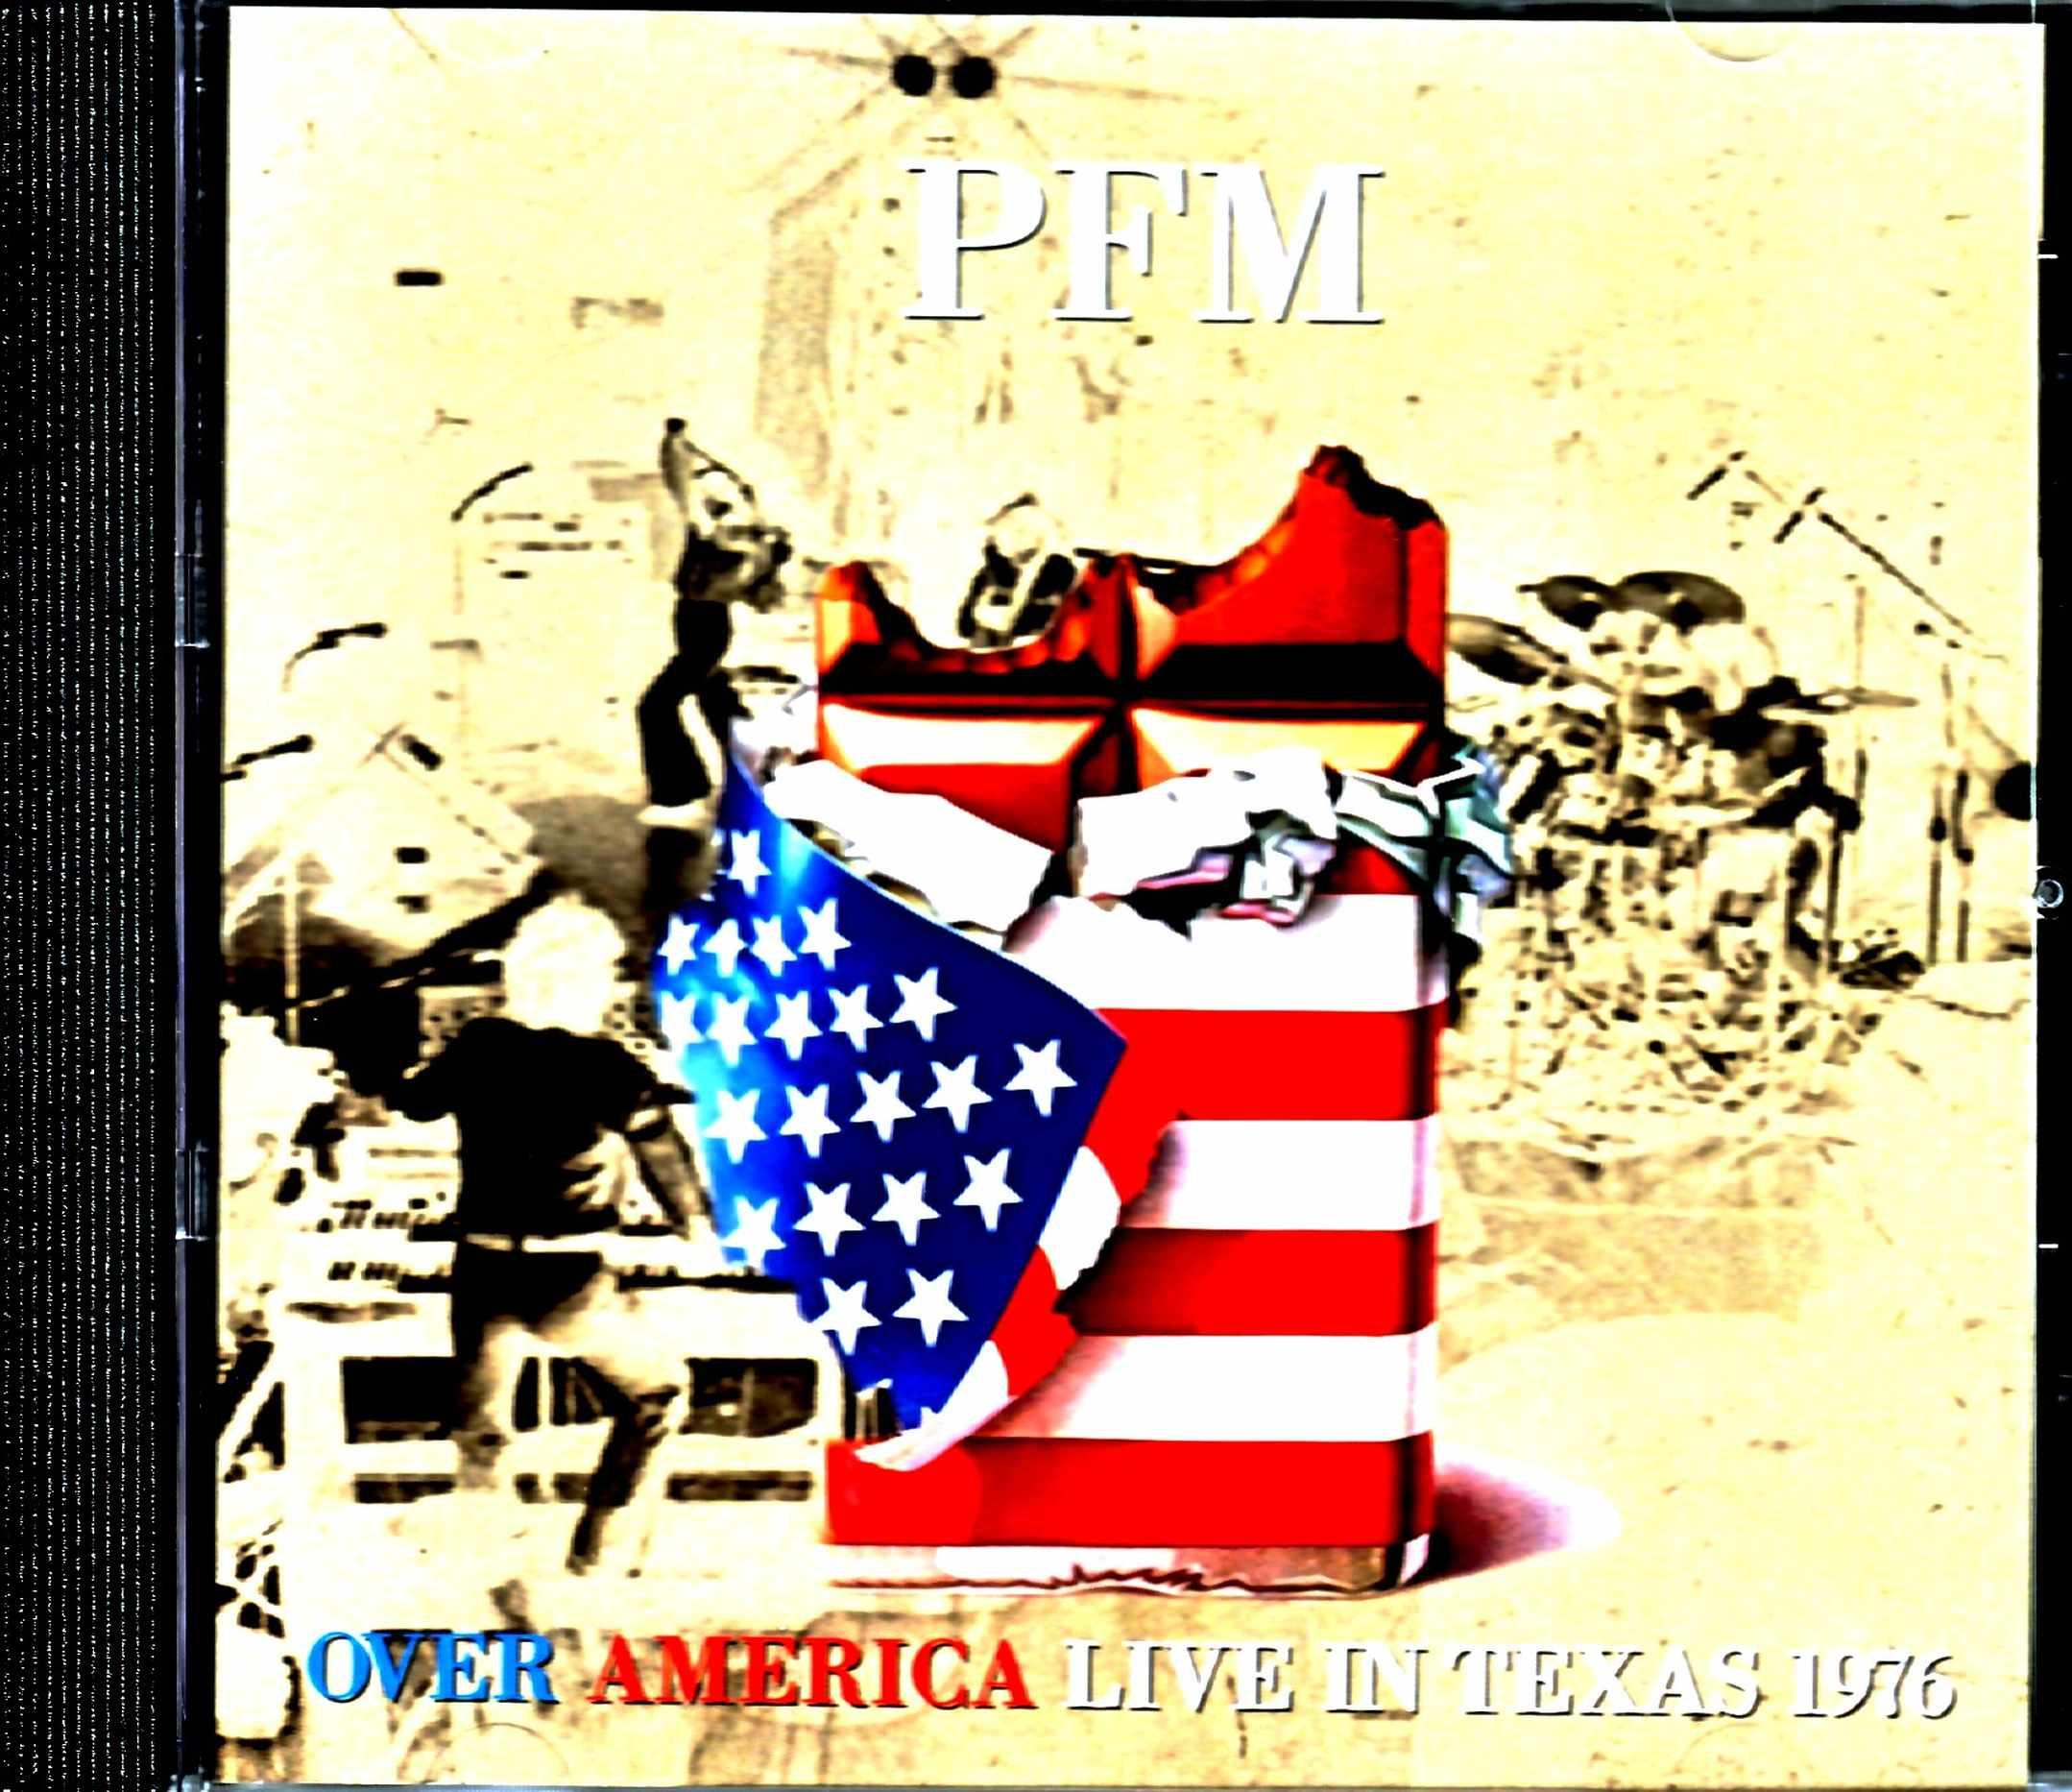 P.F.M. Premiata Forneria Marconi プレミアータ・フォルネリア・マルコーニ/TX,USA 11.16.1976